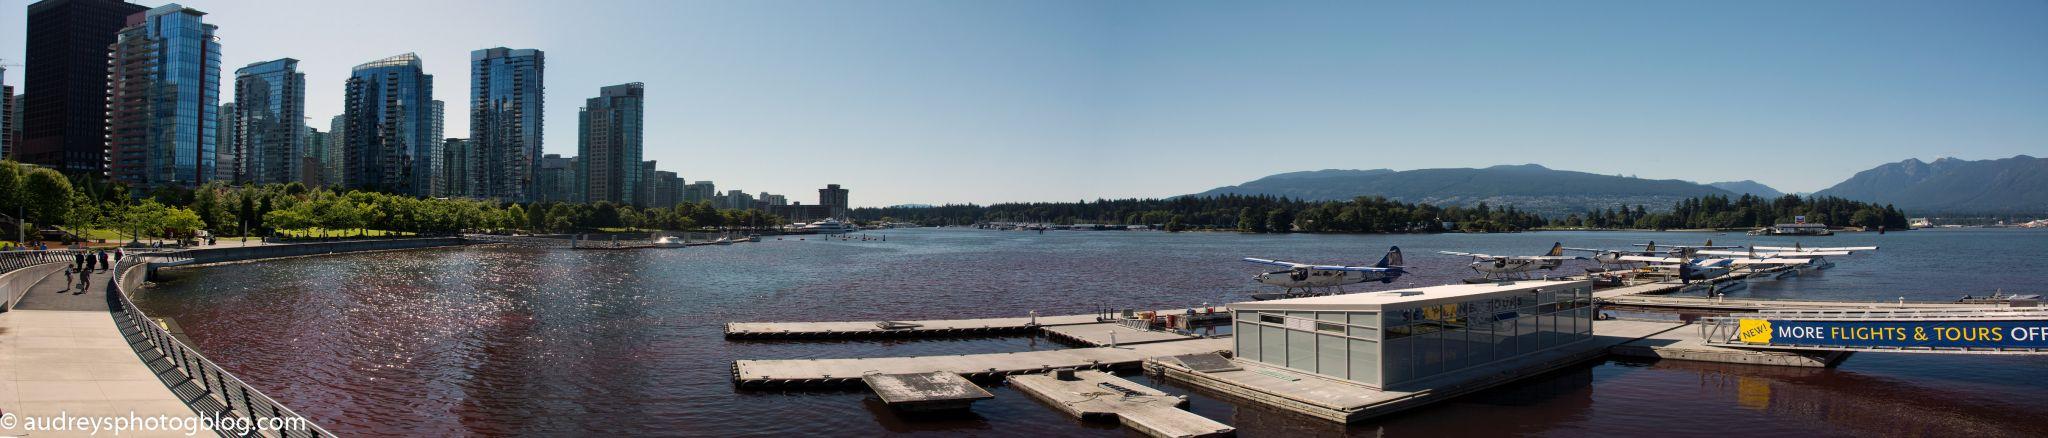 Vancouver Harbour Seaplanes, Canada